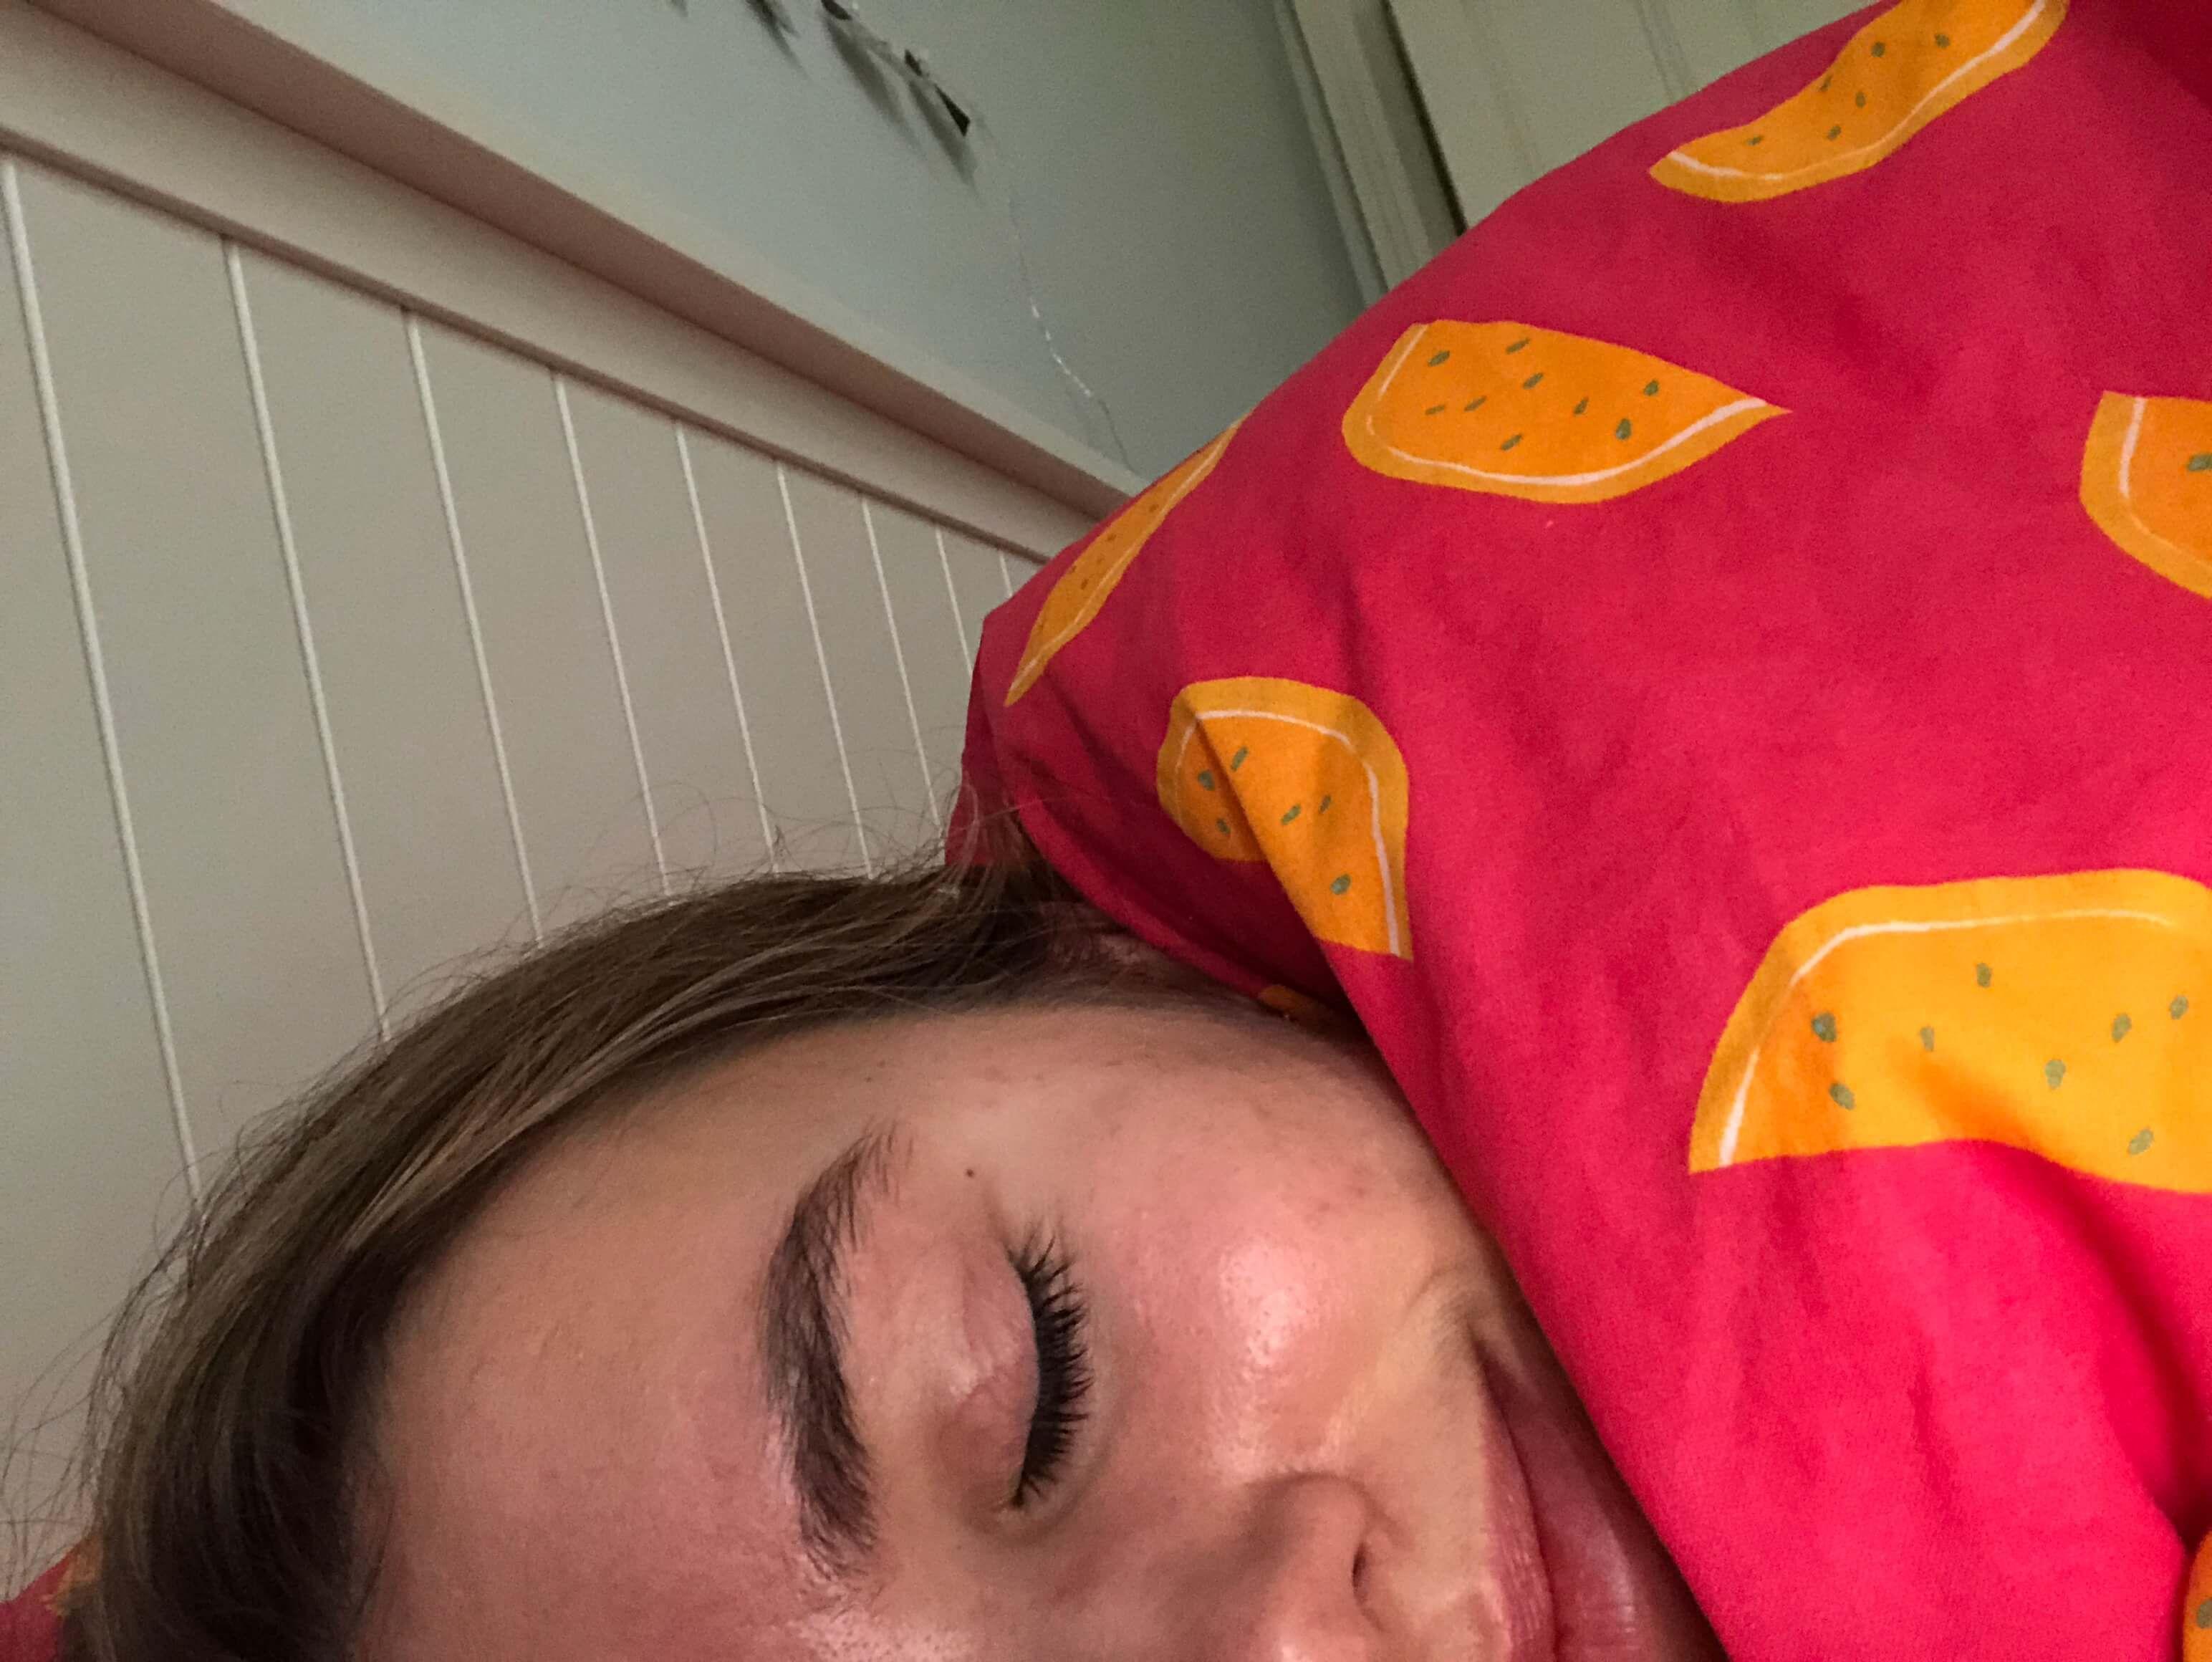 Image may contain: Asleep, Sleeping, Cushion, Head, Face, Human, Person, Clothing, Apparel